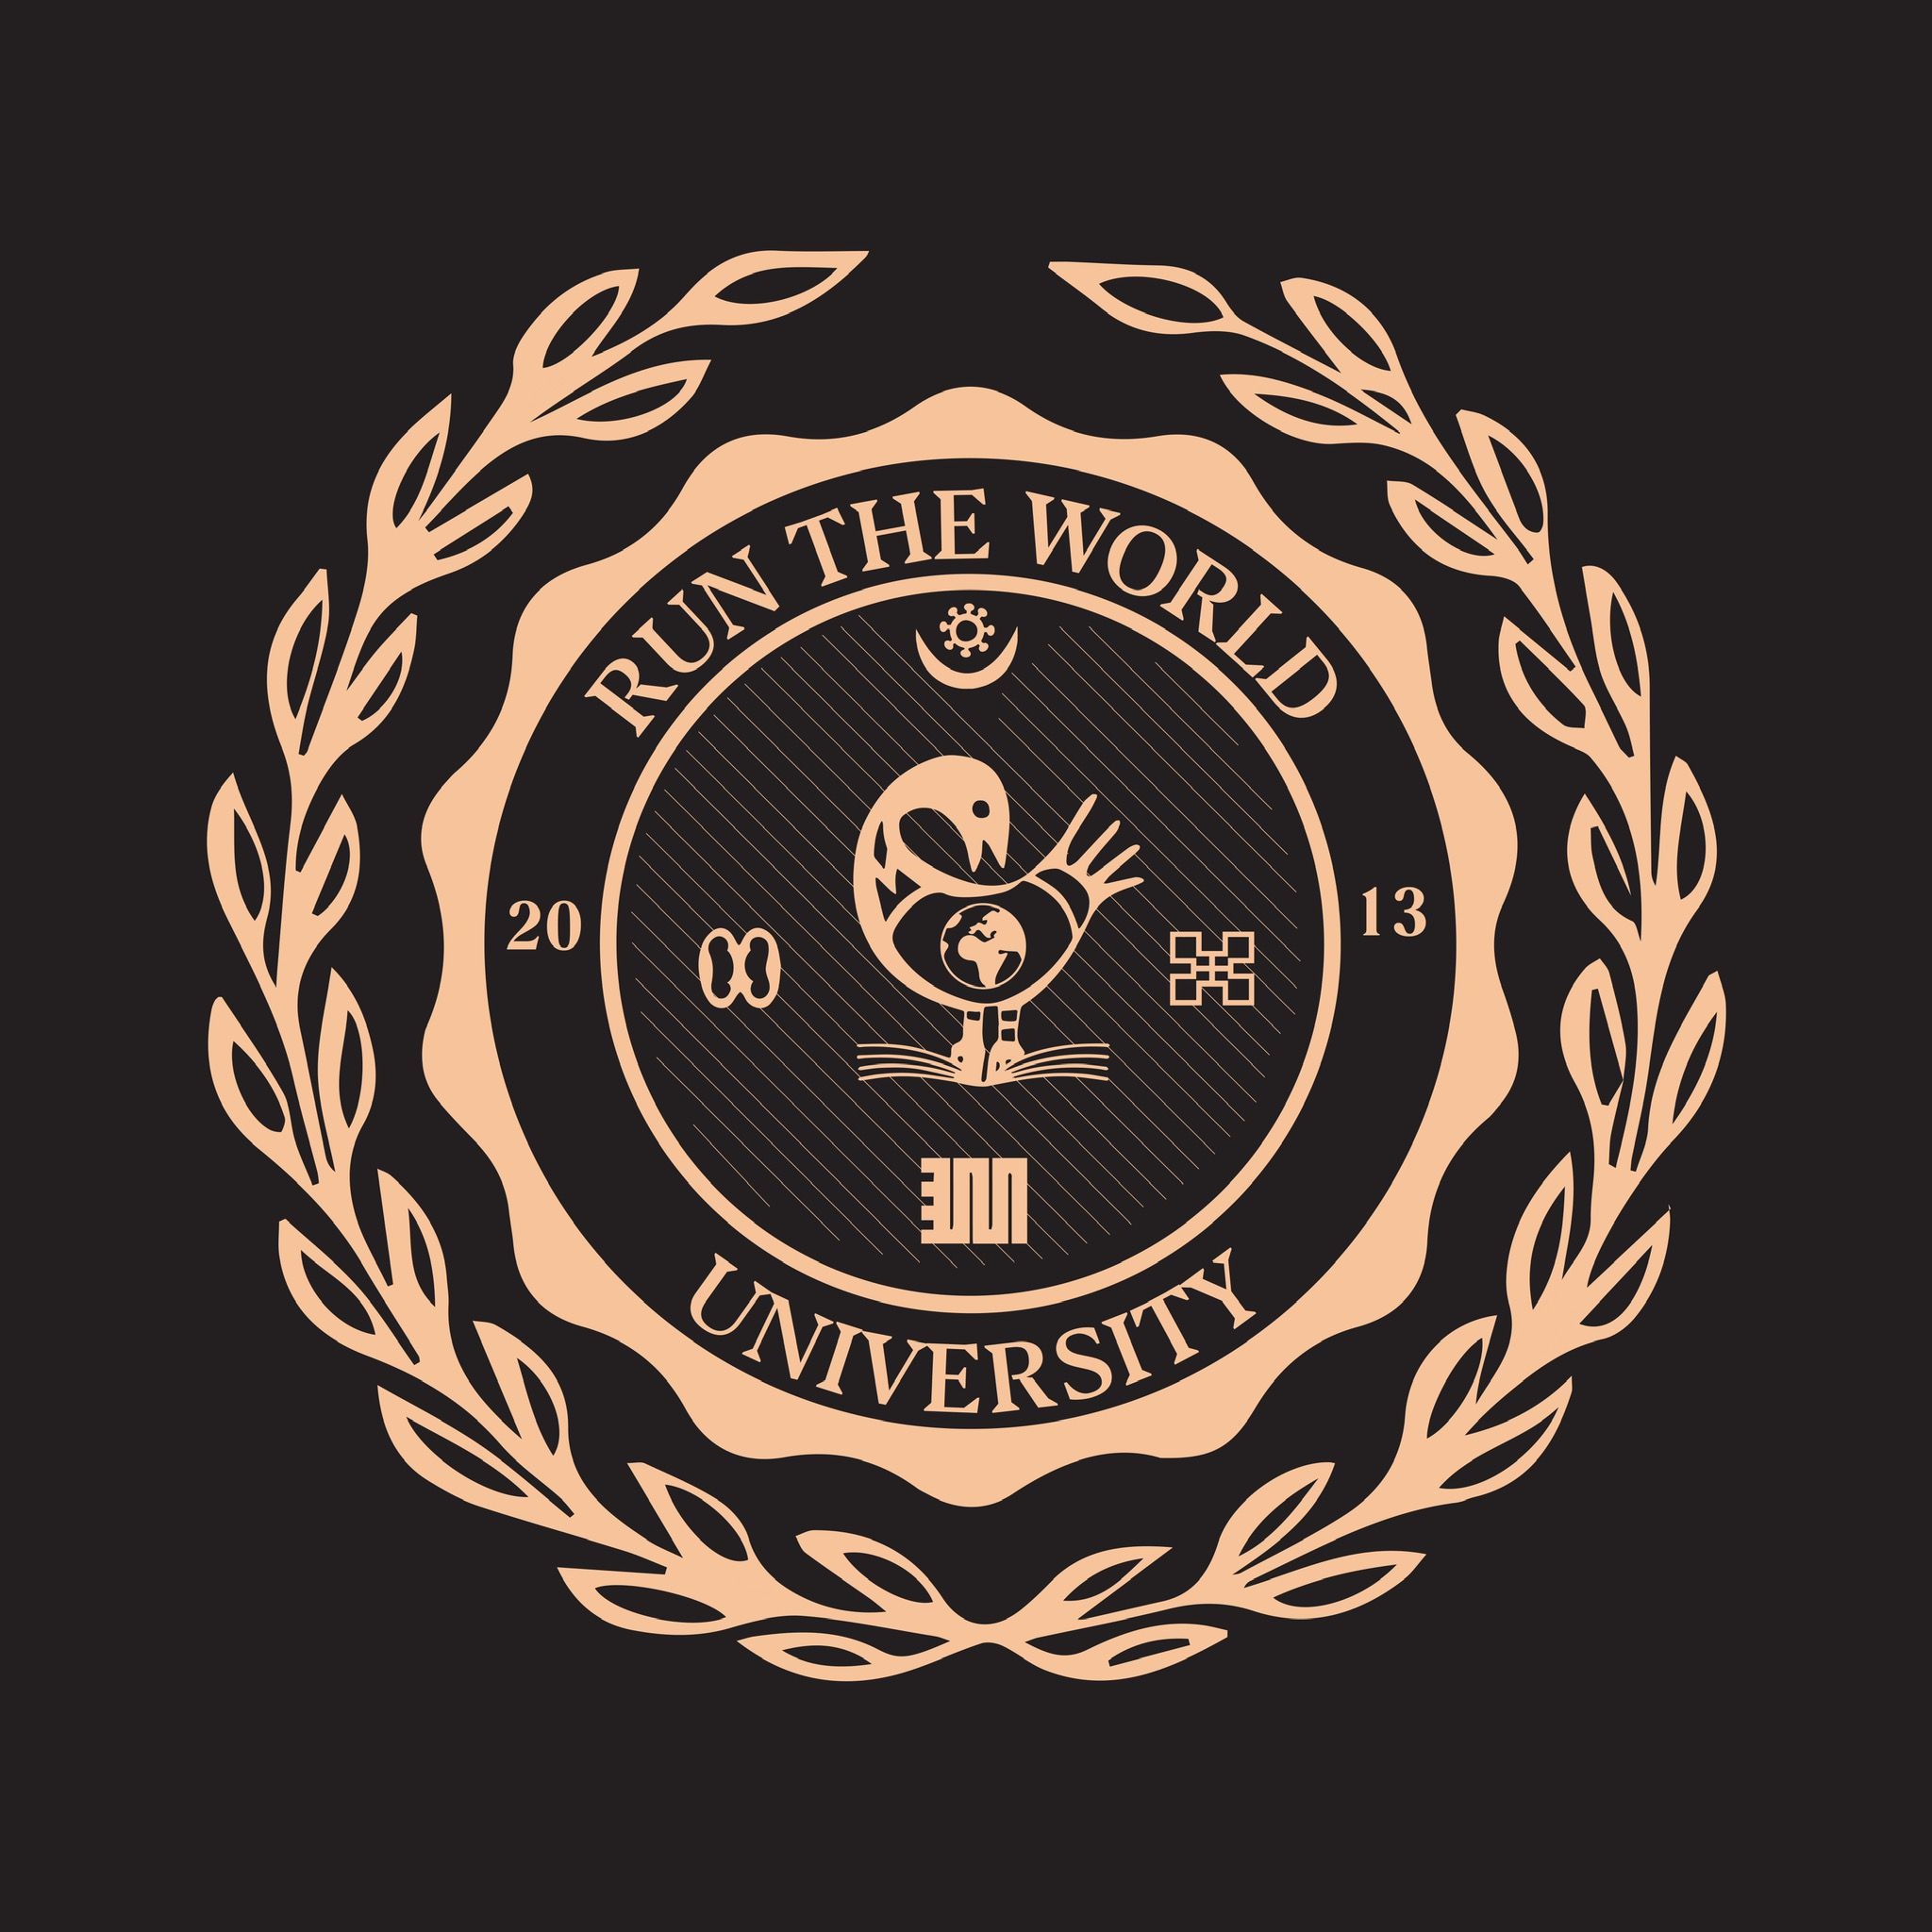 Run The World University